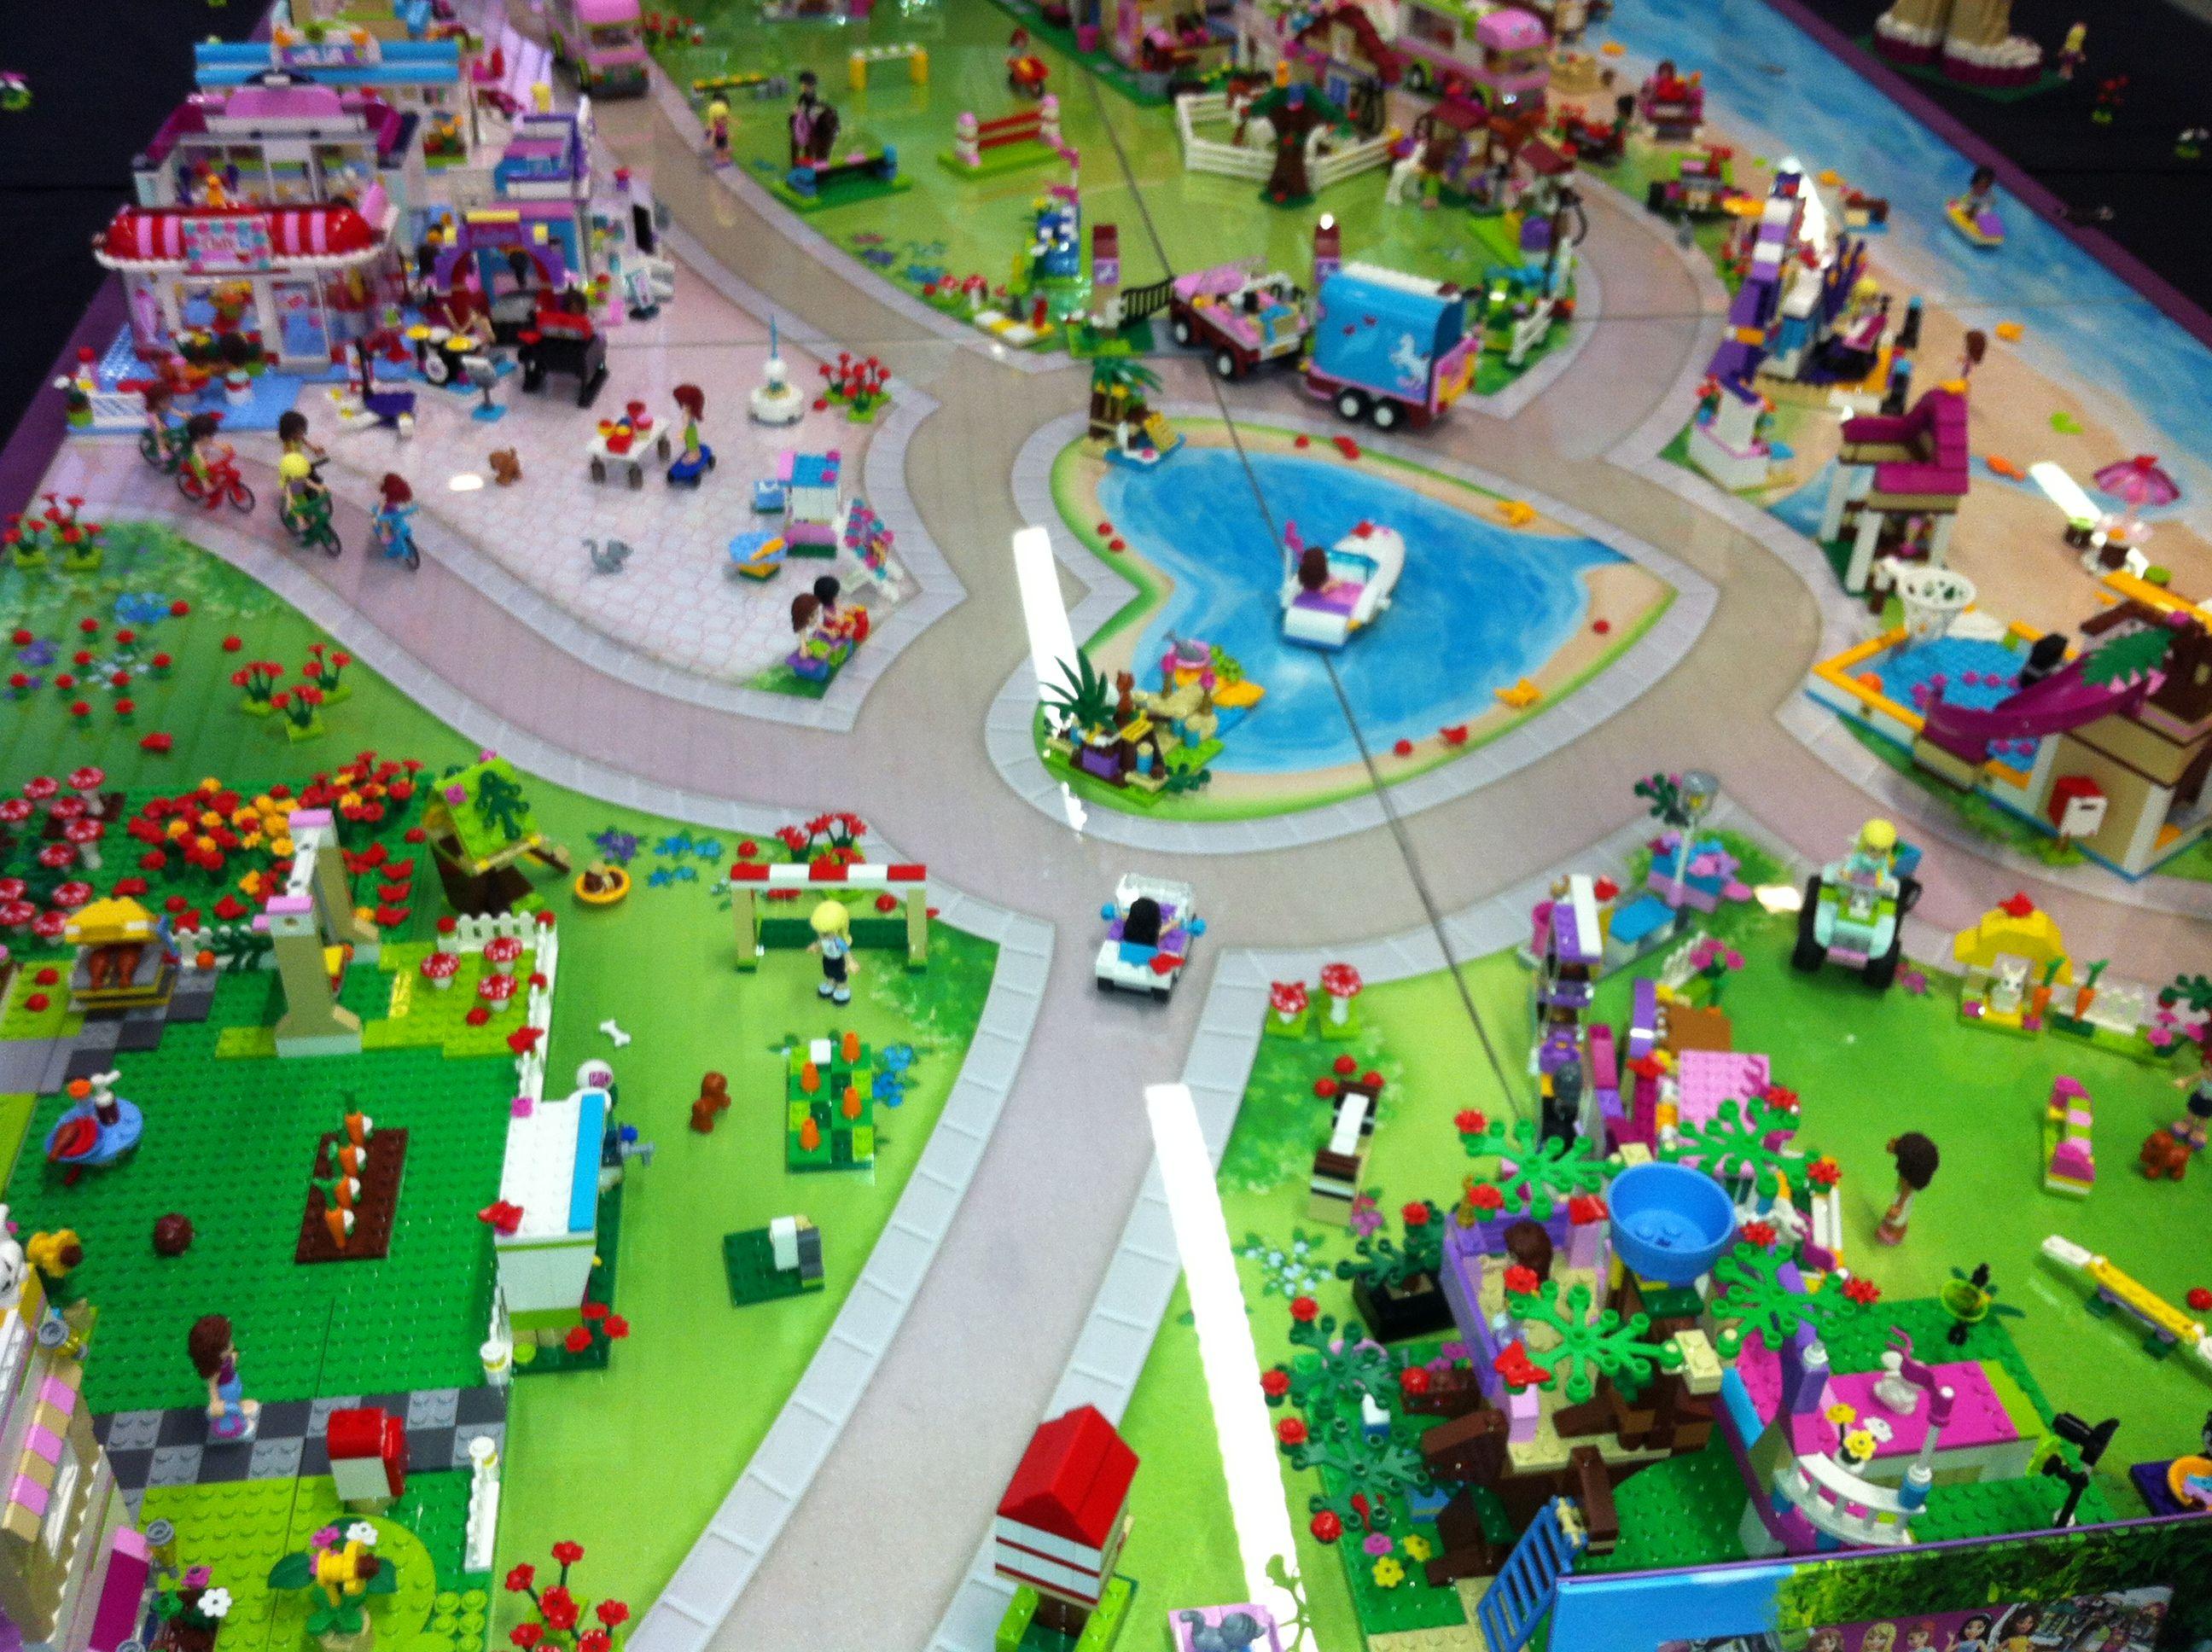 lego friends 2 592 —1 936 pixels Lego ideer